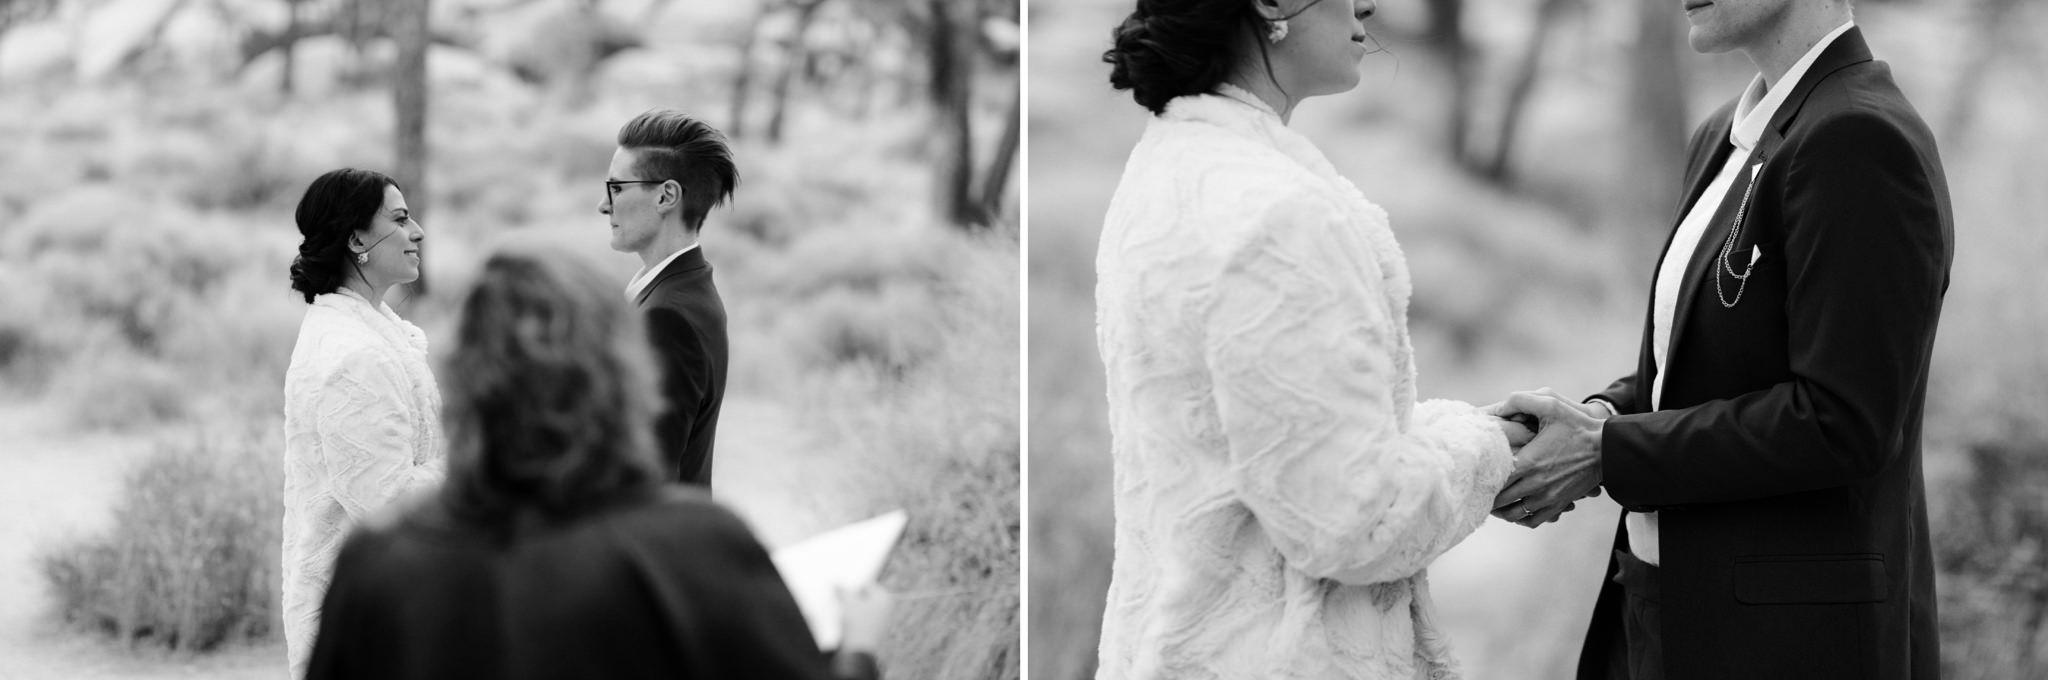 joshua tree wedding 070